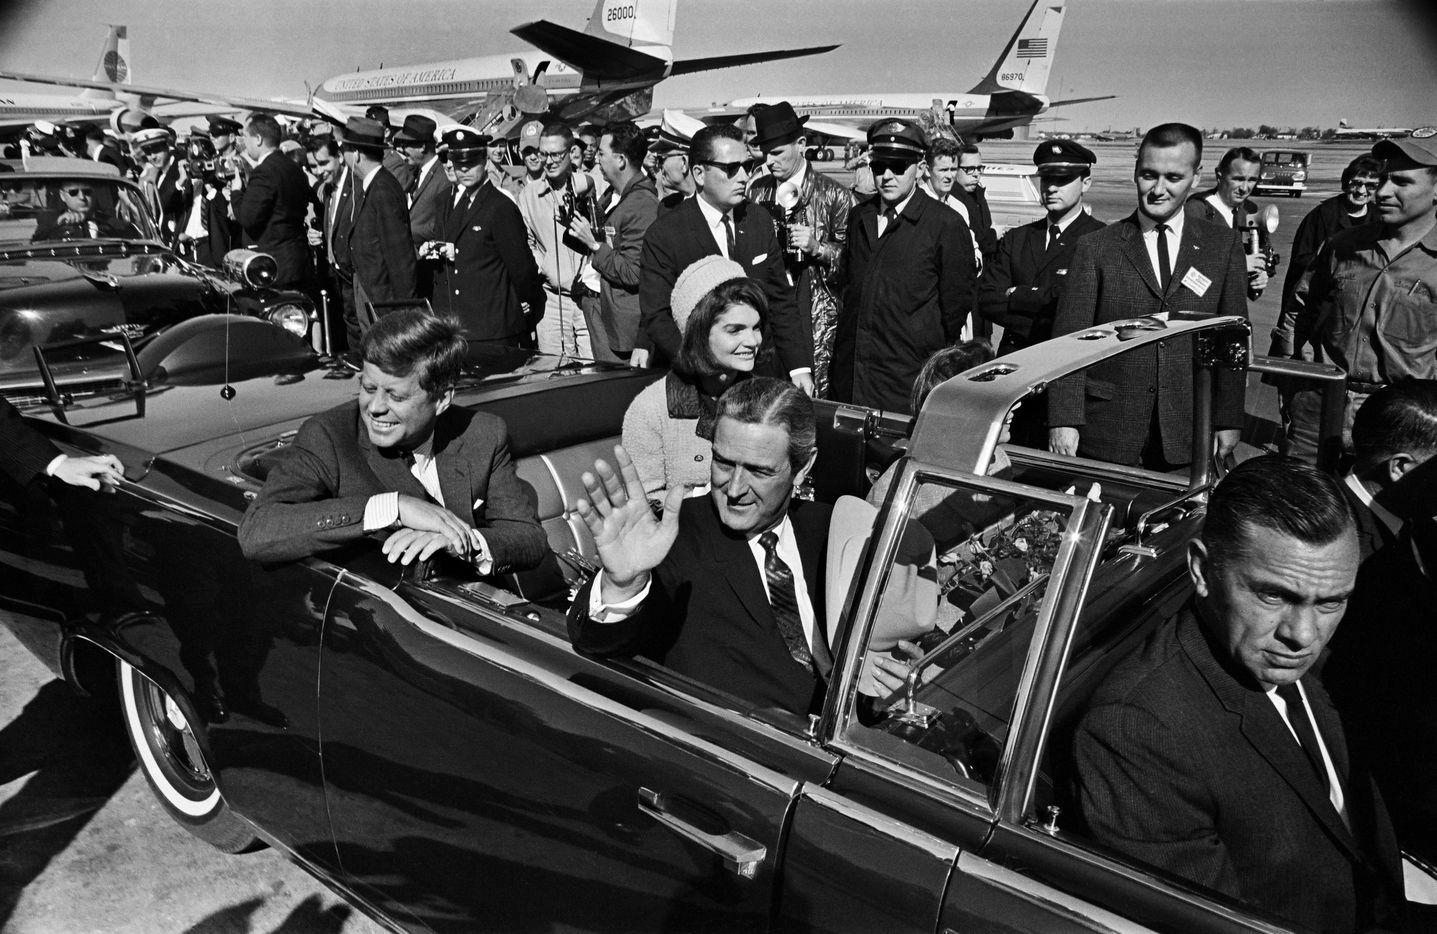 President John F. Kennedy and Jacqueline Kennedy begin the motorcade from Love Field to downtown Dallas on Nov. 22, 1963. Texas Gov. John Connally is waving. (Tom Dillard/The Dallas Morning News)